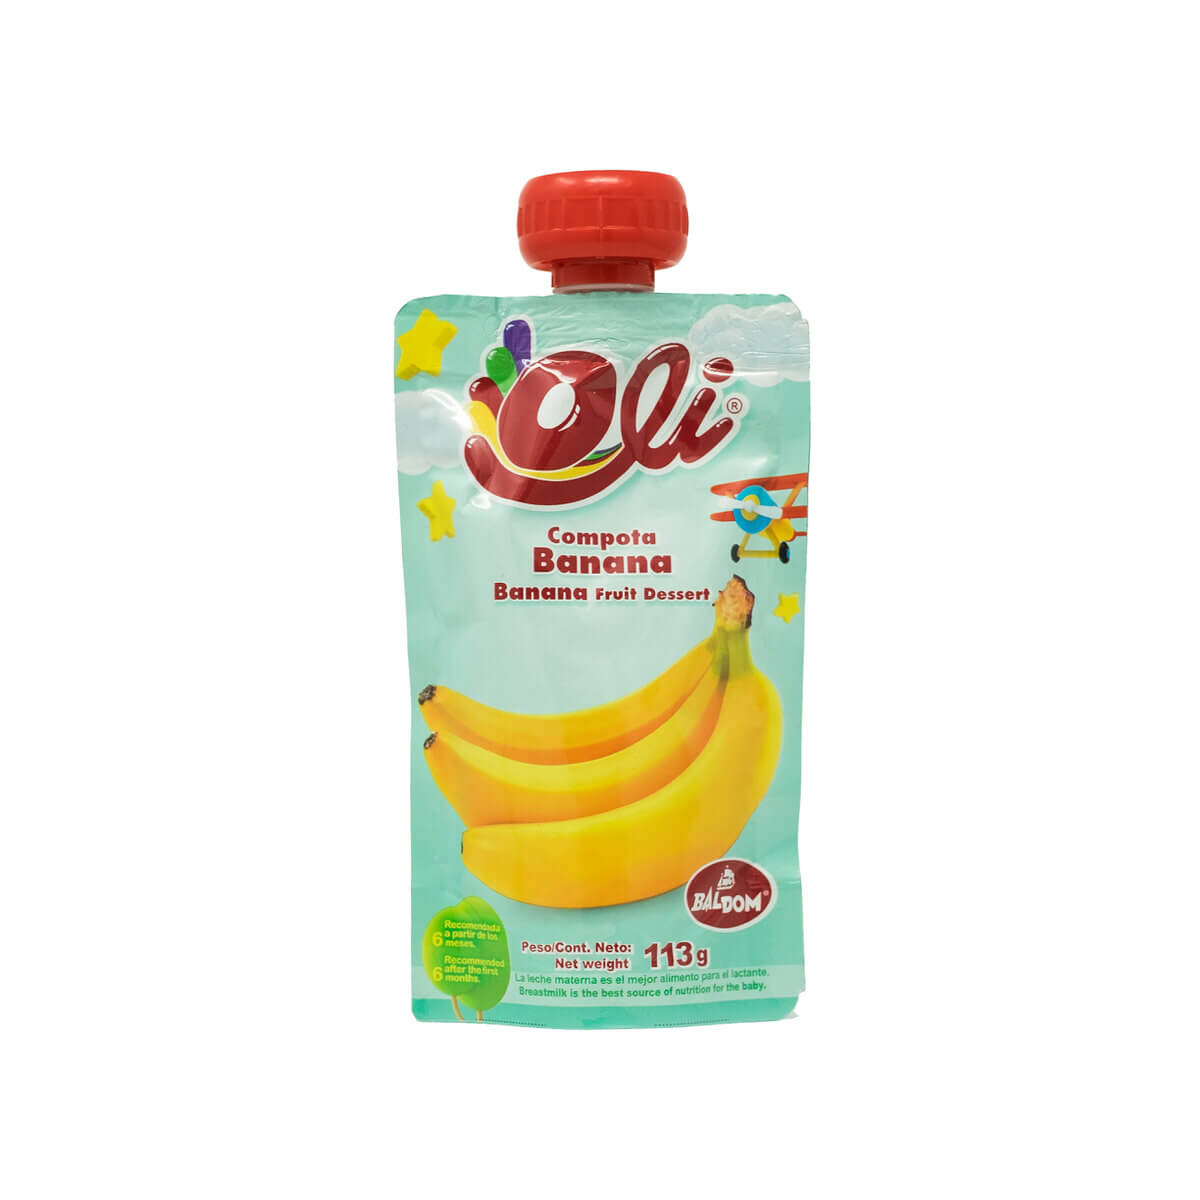 Compota Banana Oli fácil pack